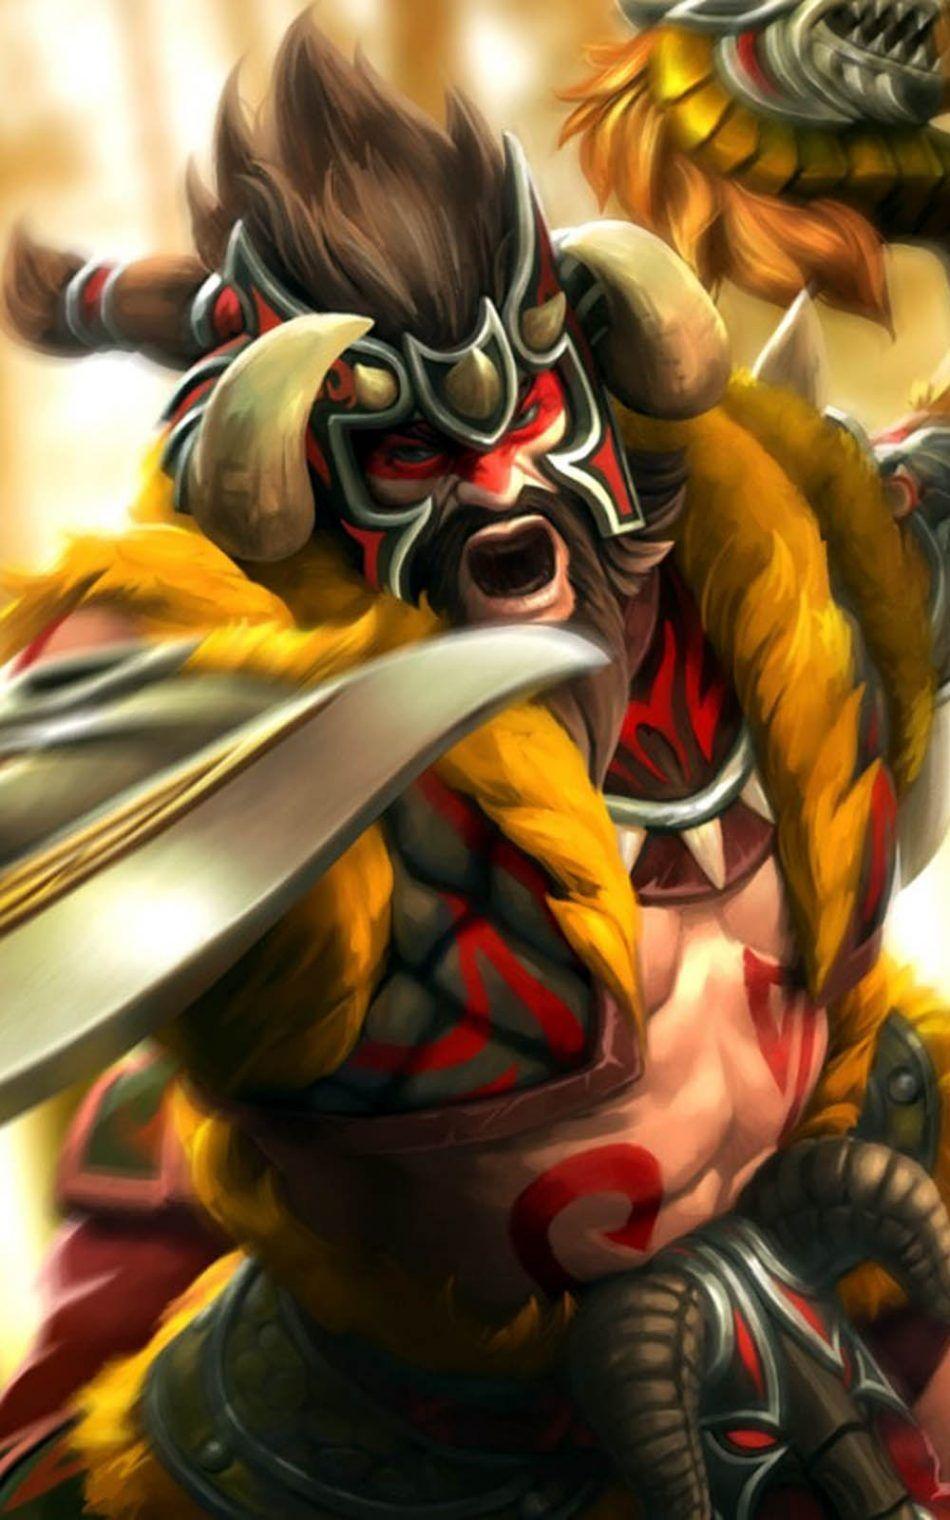 Beastmaster Dota 2 Dota 2 Dota 2 Wallpaper Defense Of The Ancients